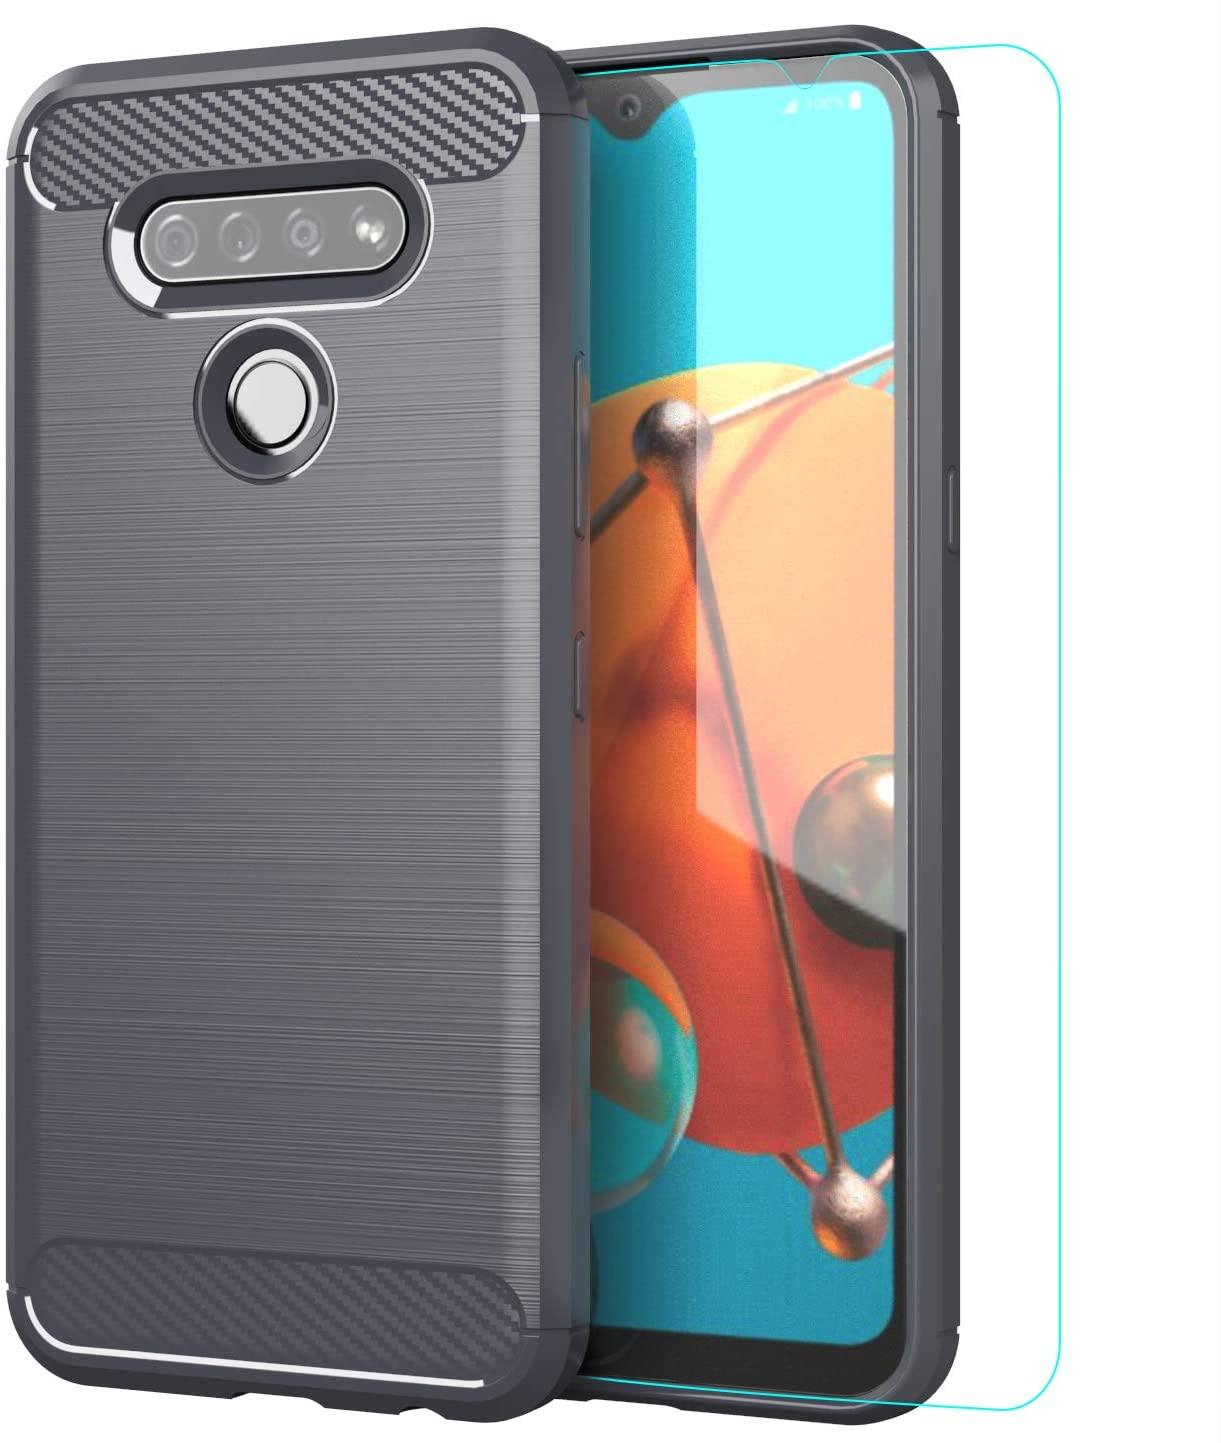 LG K51 Case,LG Q51 Case,with HD Screen Protector,LG Reflect case,Damping Soft TPU Slim Fashion Non-Slip Protective Phone Case,for LG K51 Phone Case (LG K51-Gray)